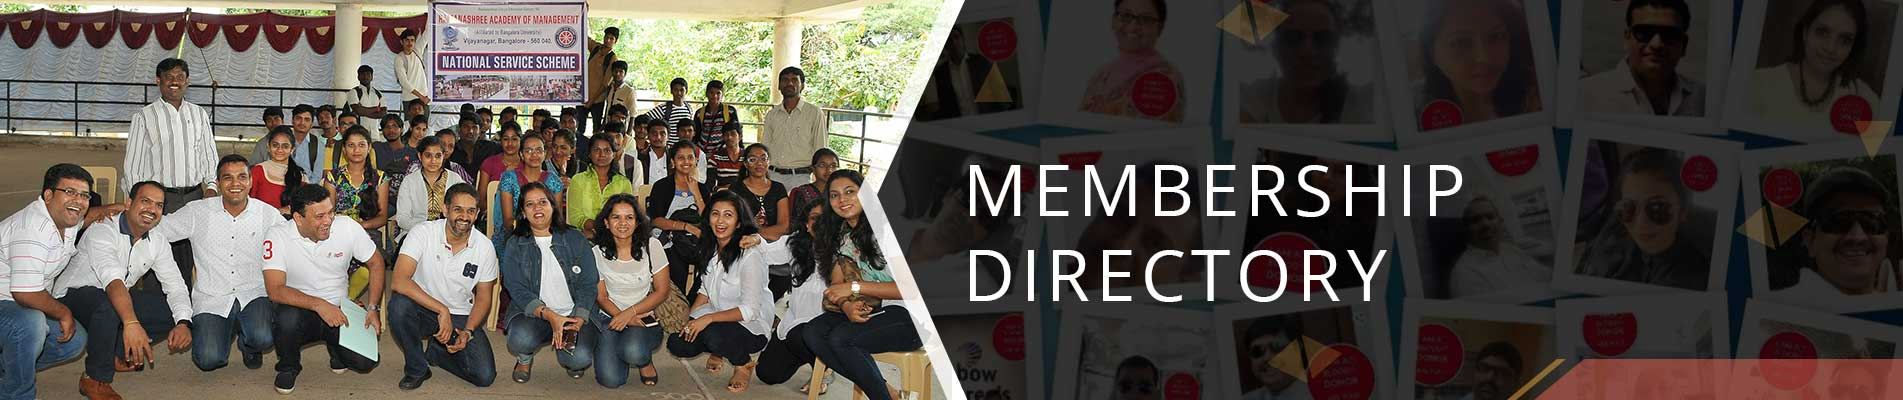 membership-directory